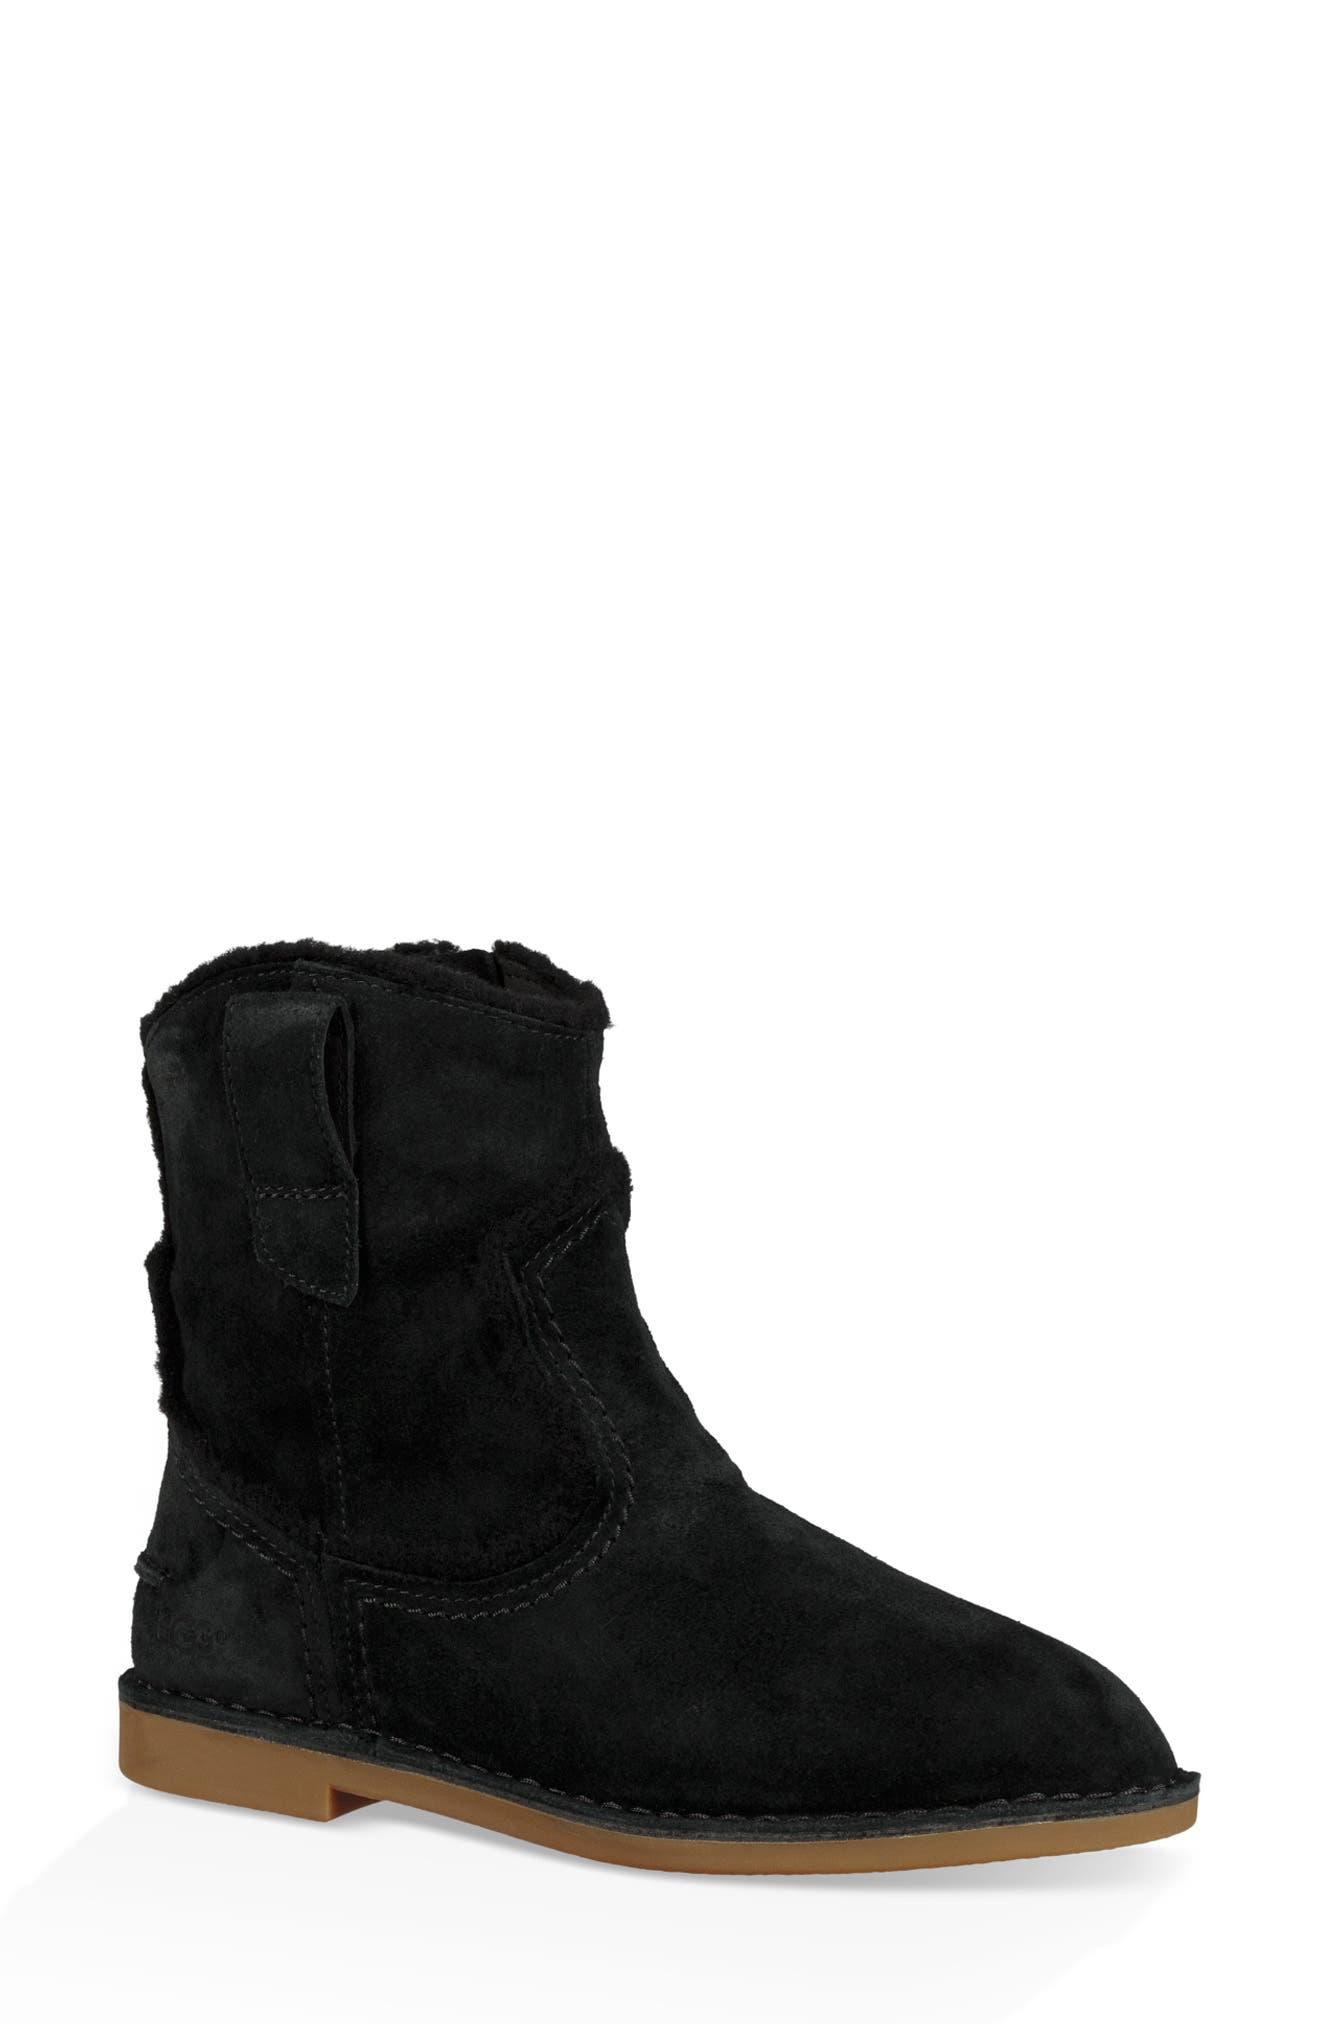 UGG<SUP>®</SUP>, Catica Boot, Main thumbnail 1, color, 001